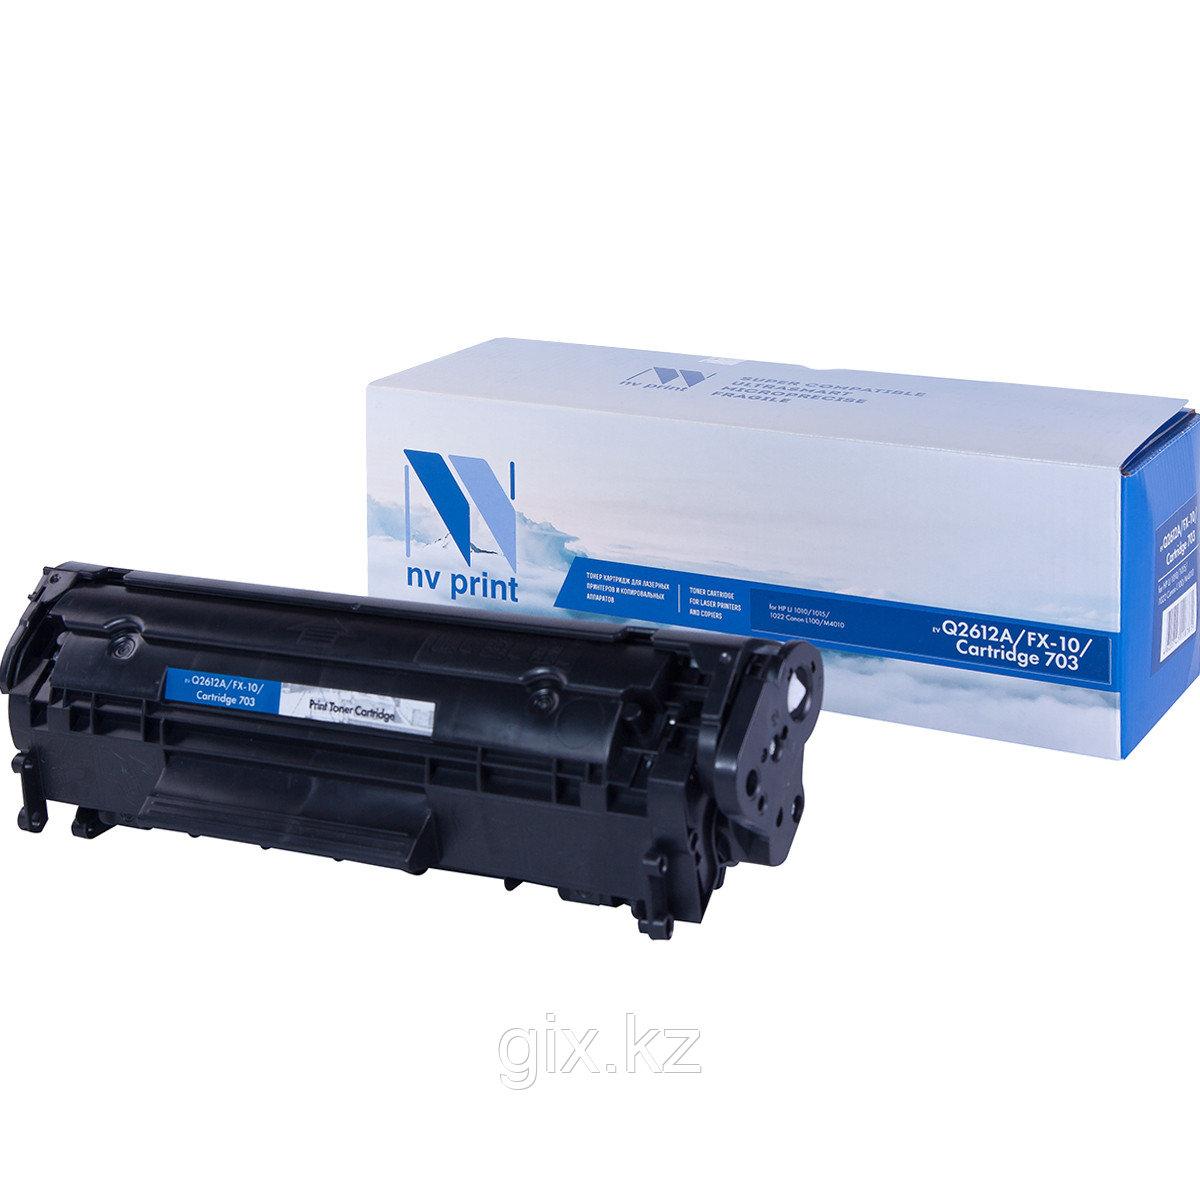 Картридж HP Q2612A/Canon FX-10/703